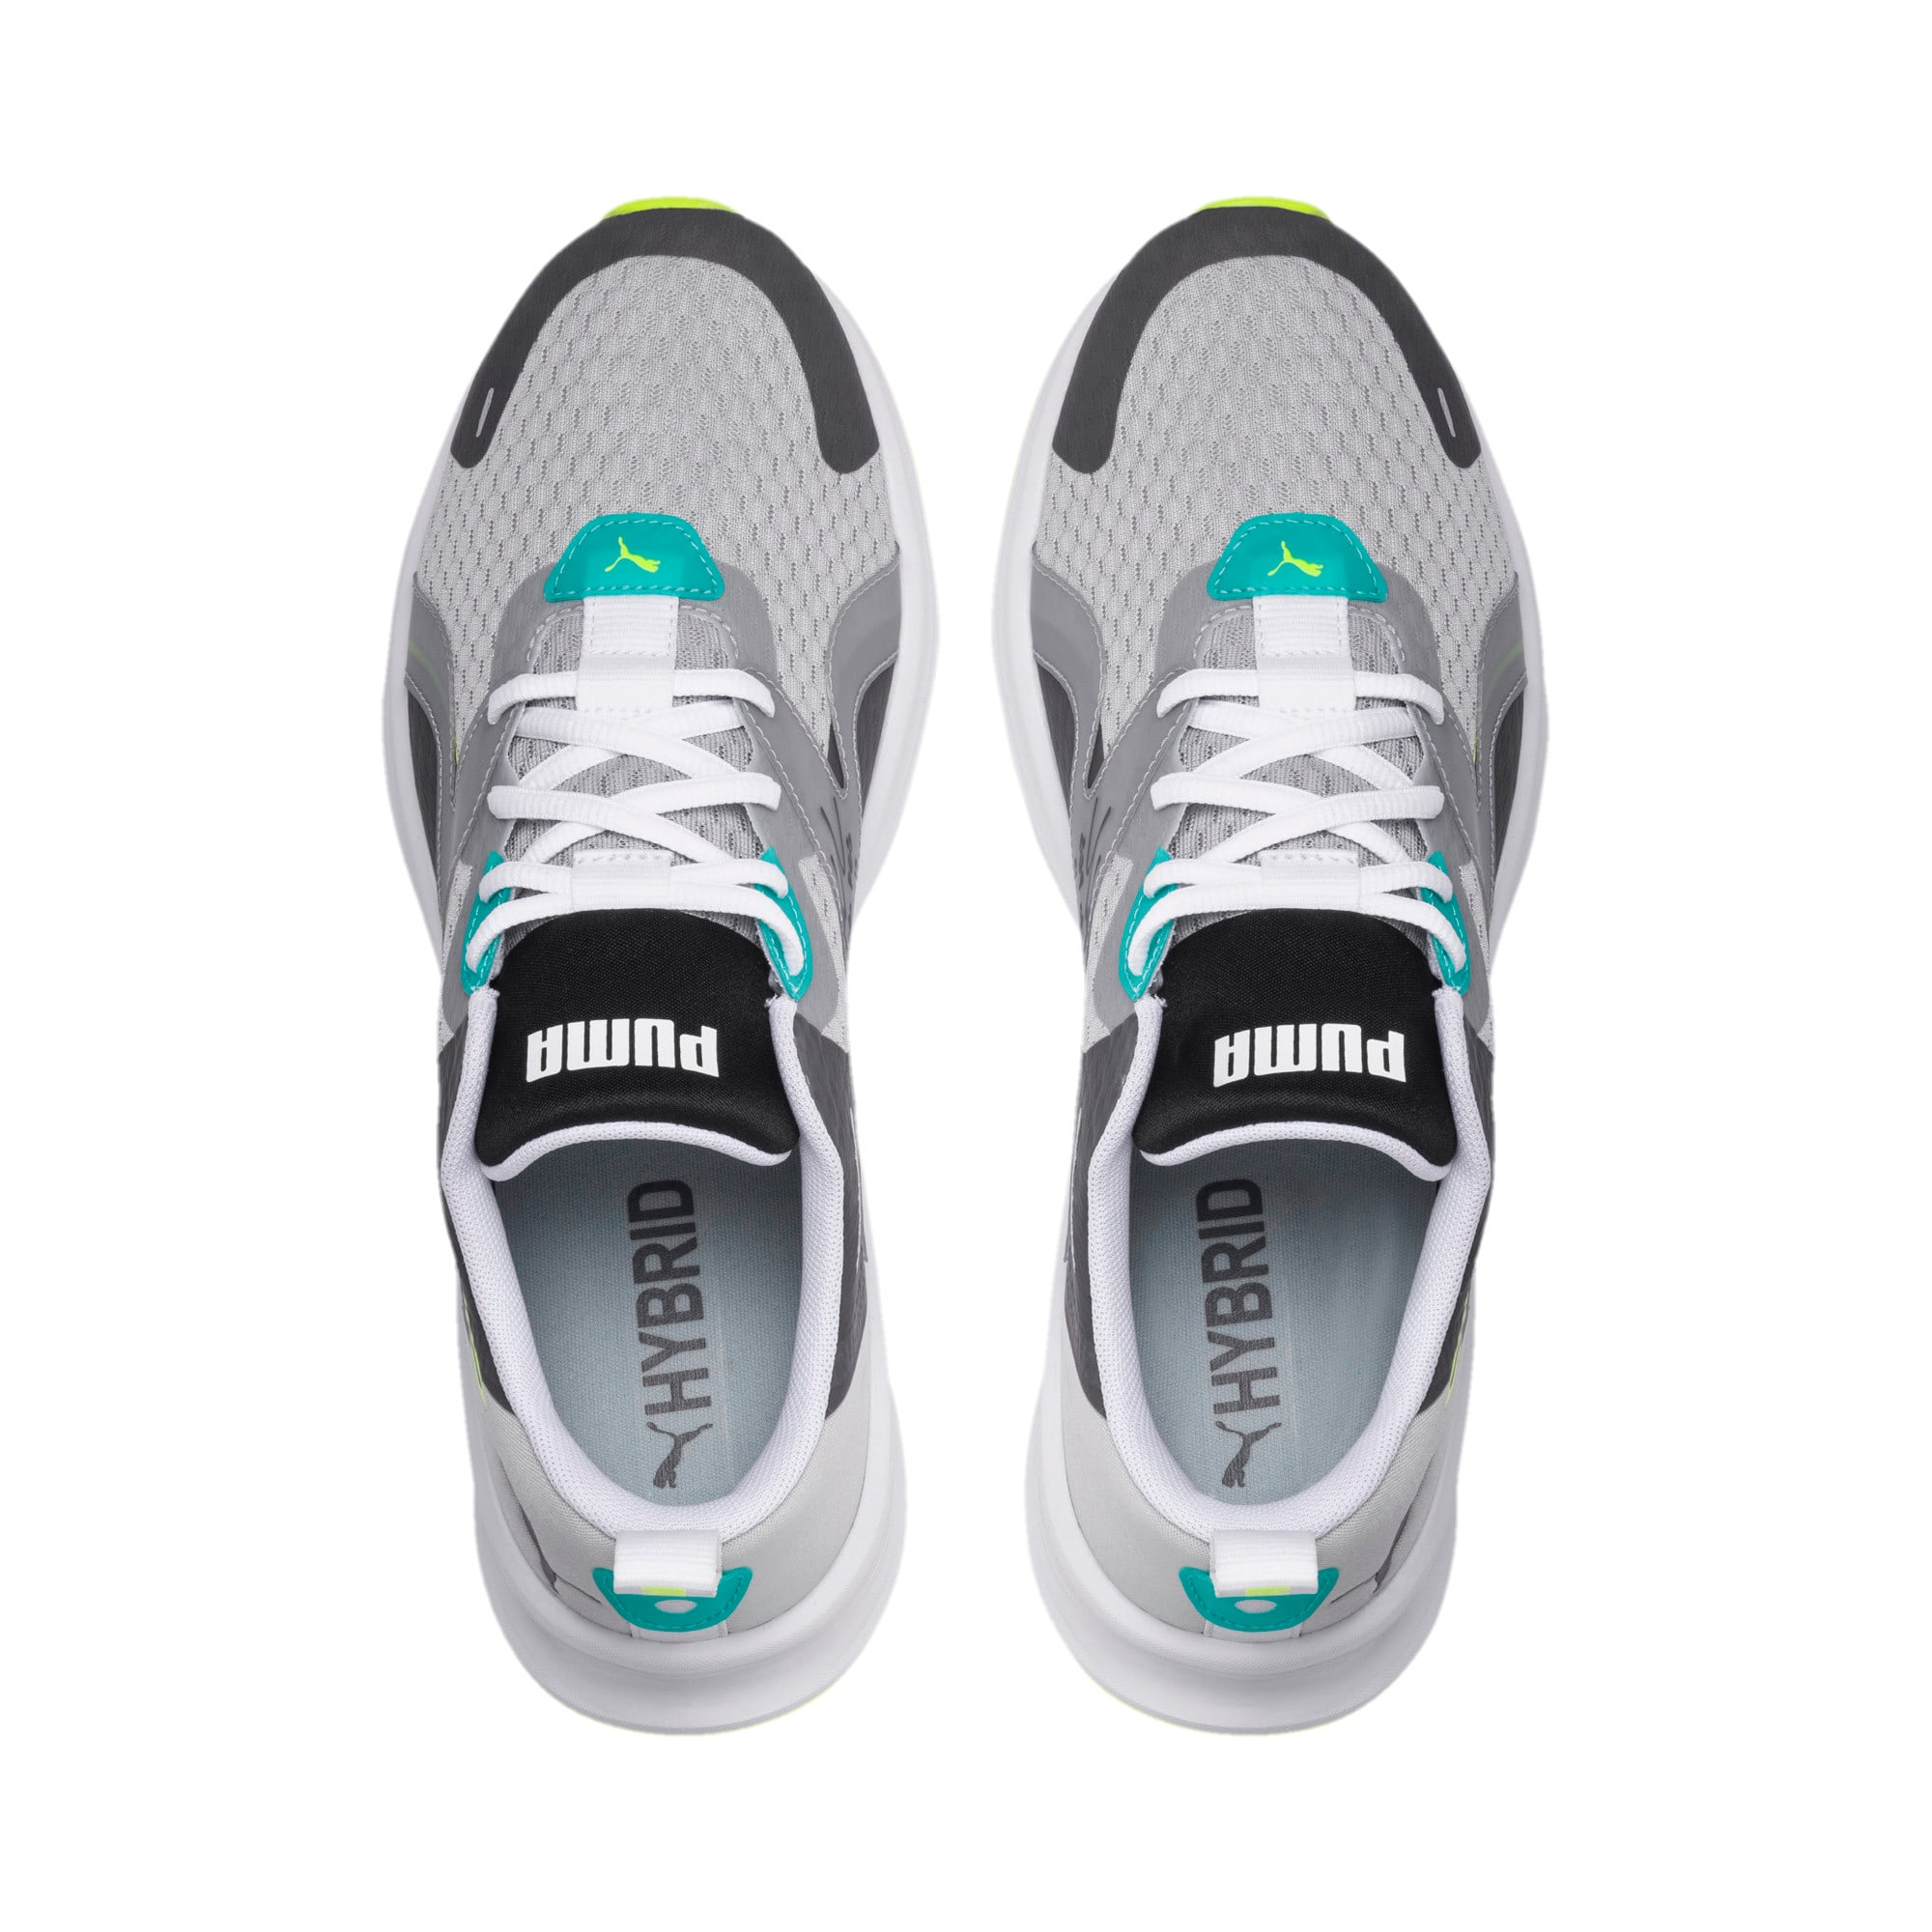 Miniatura 6 de Zapatos para correr HYBRID Fuego para hombre, High Rise-Blue Turquoise, mediano